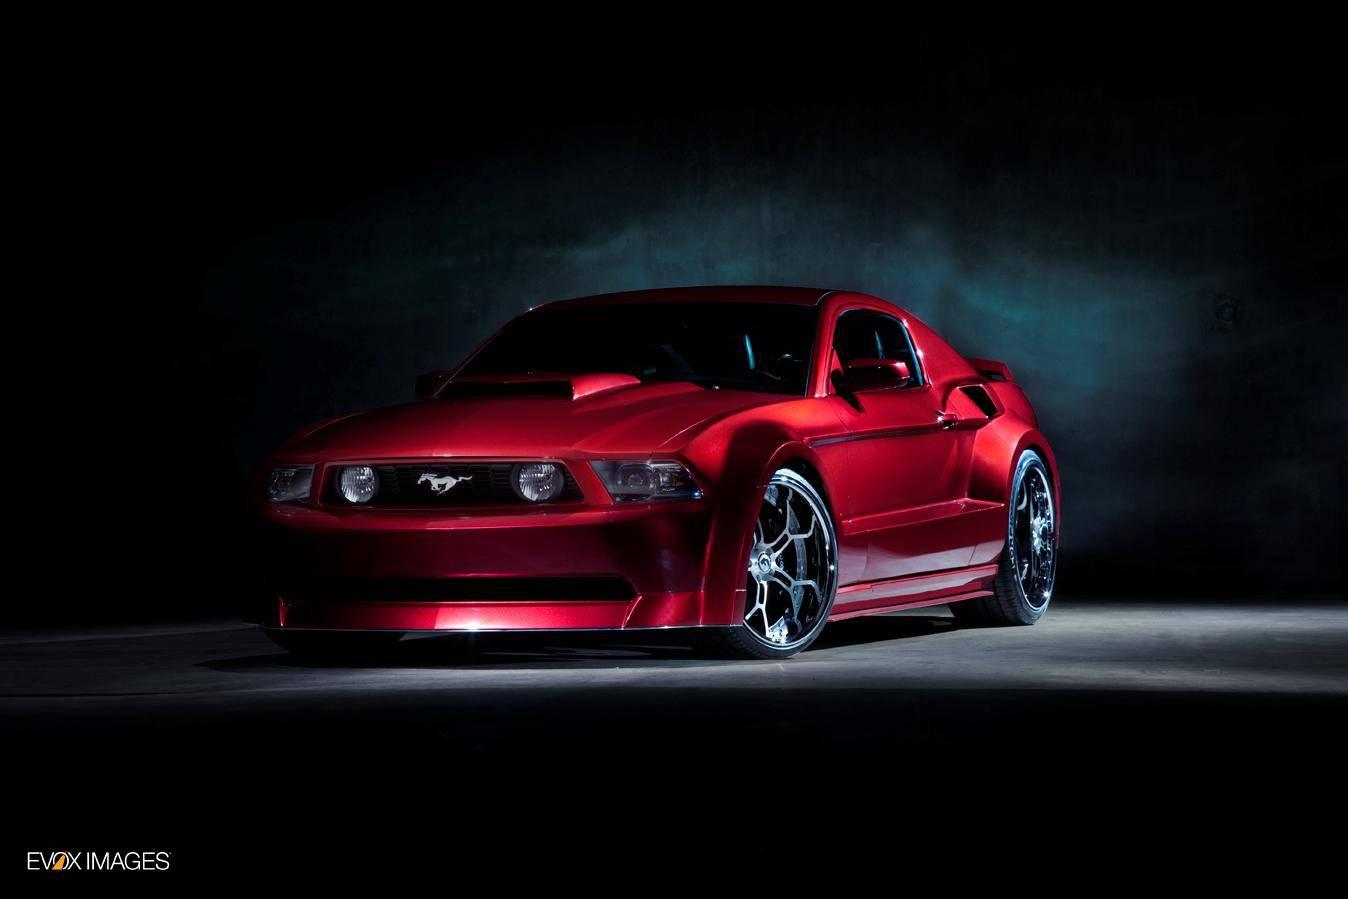 2014 Mustang HD Wallpaper Cars Wallpapers 1348x899